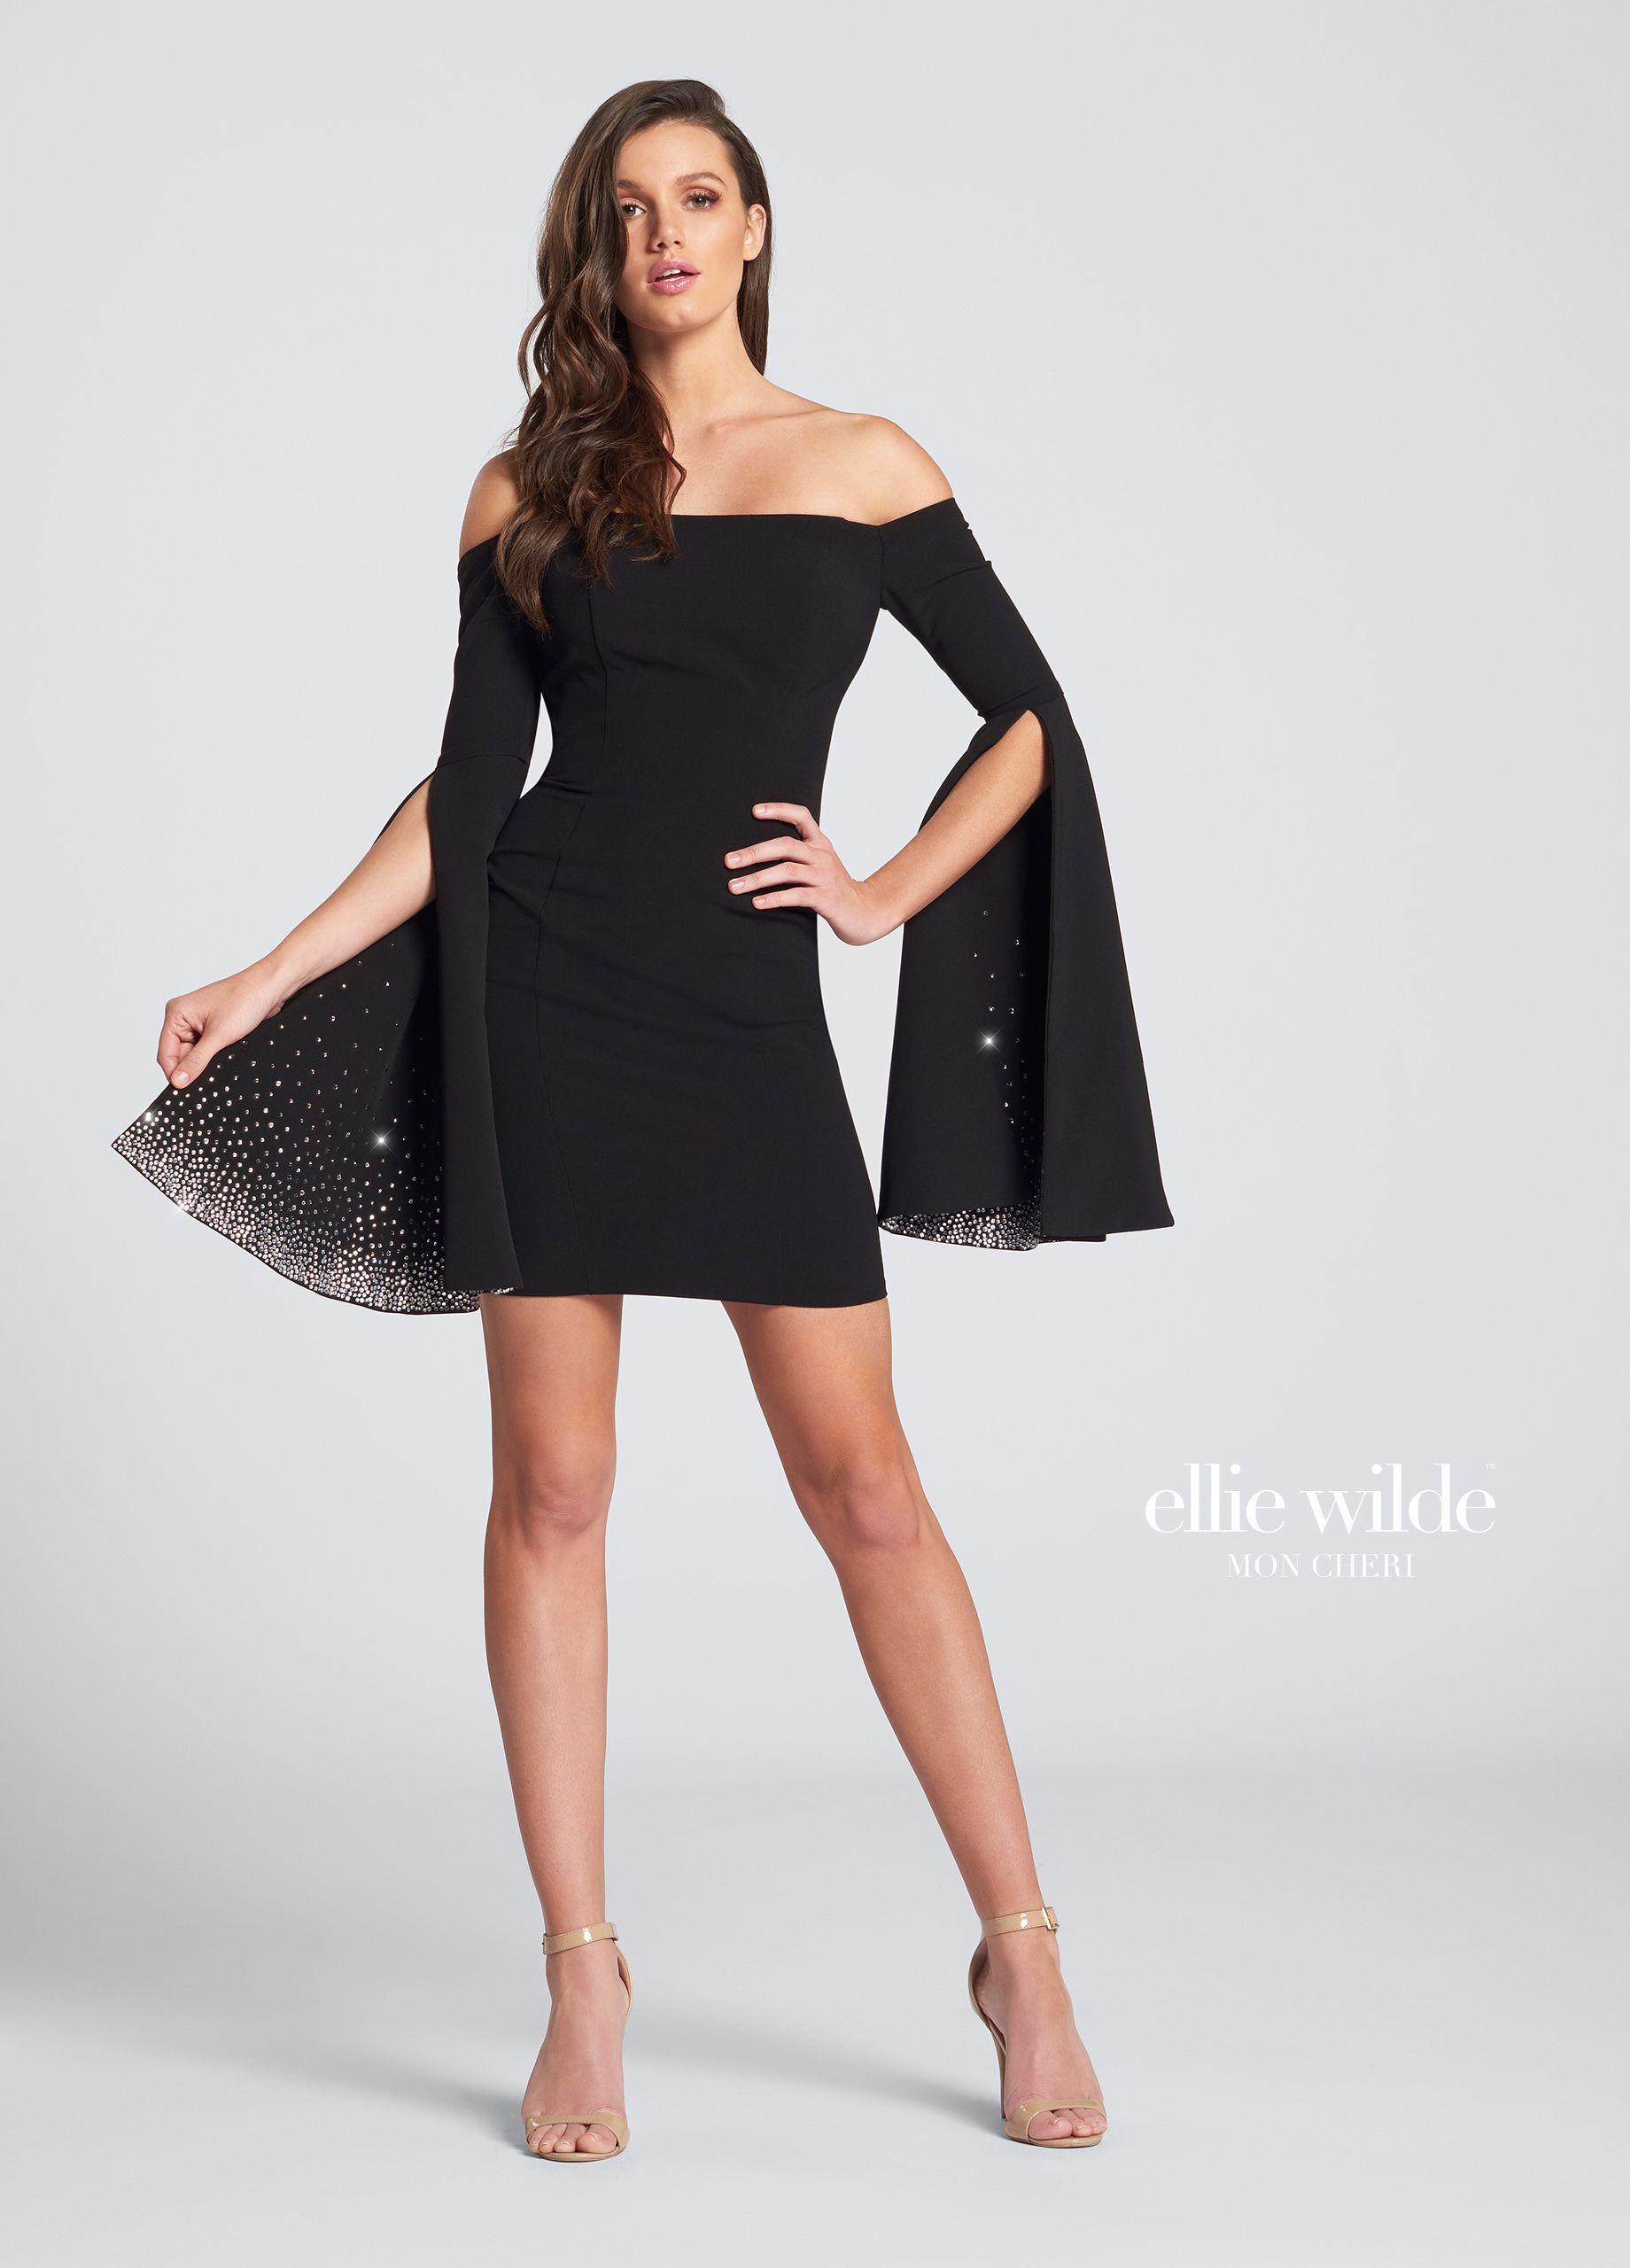 Black Bell Sleeve Off-The-Shoulder Mini Dress- EW21729s | Pinterest ...